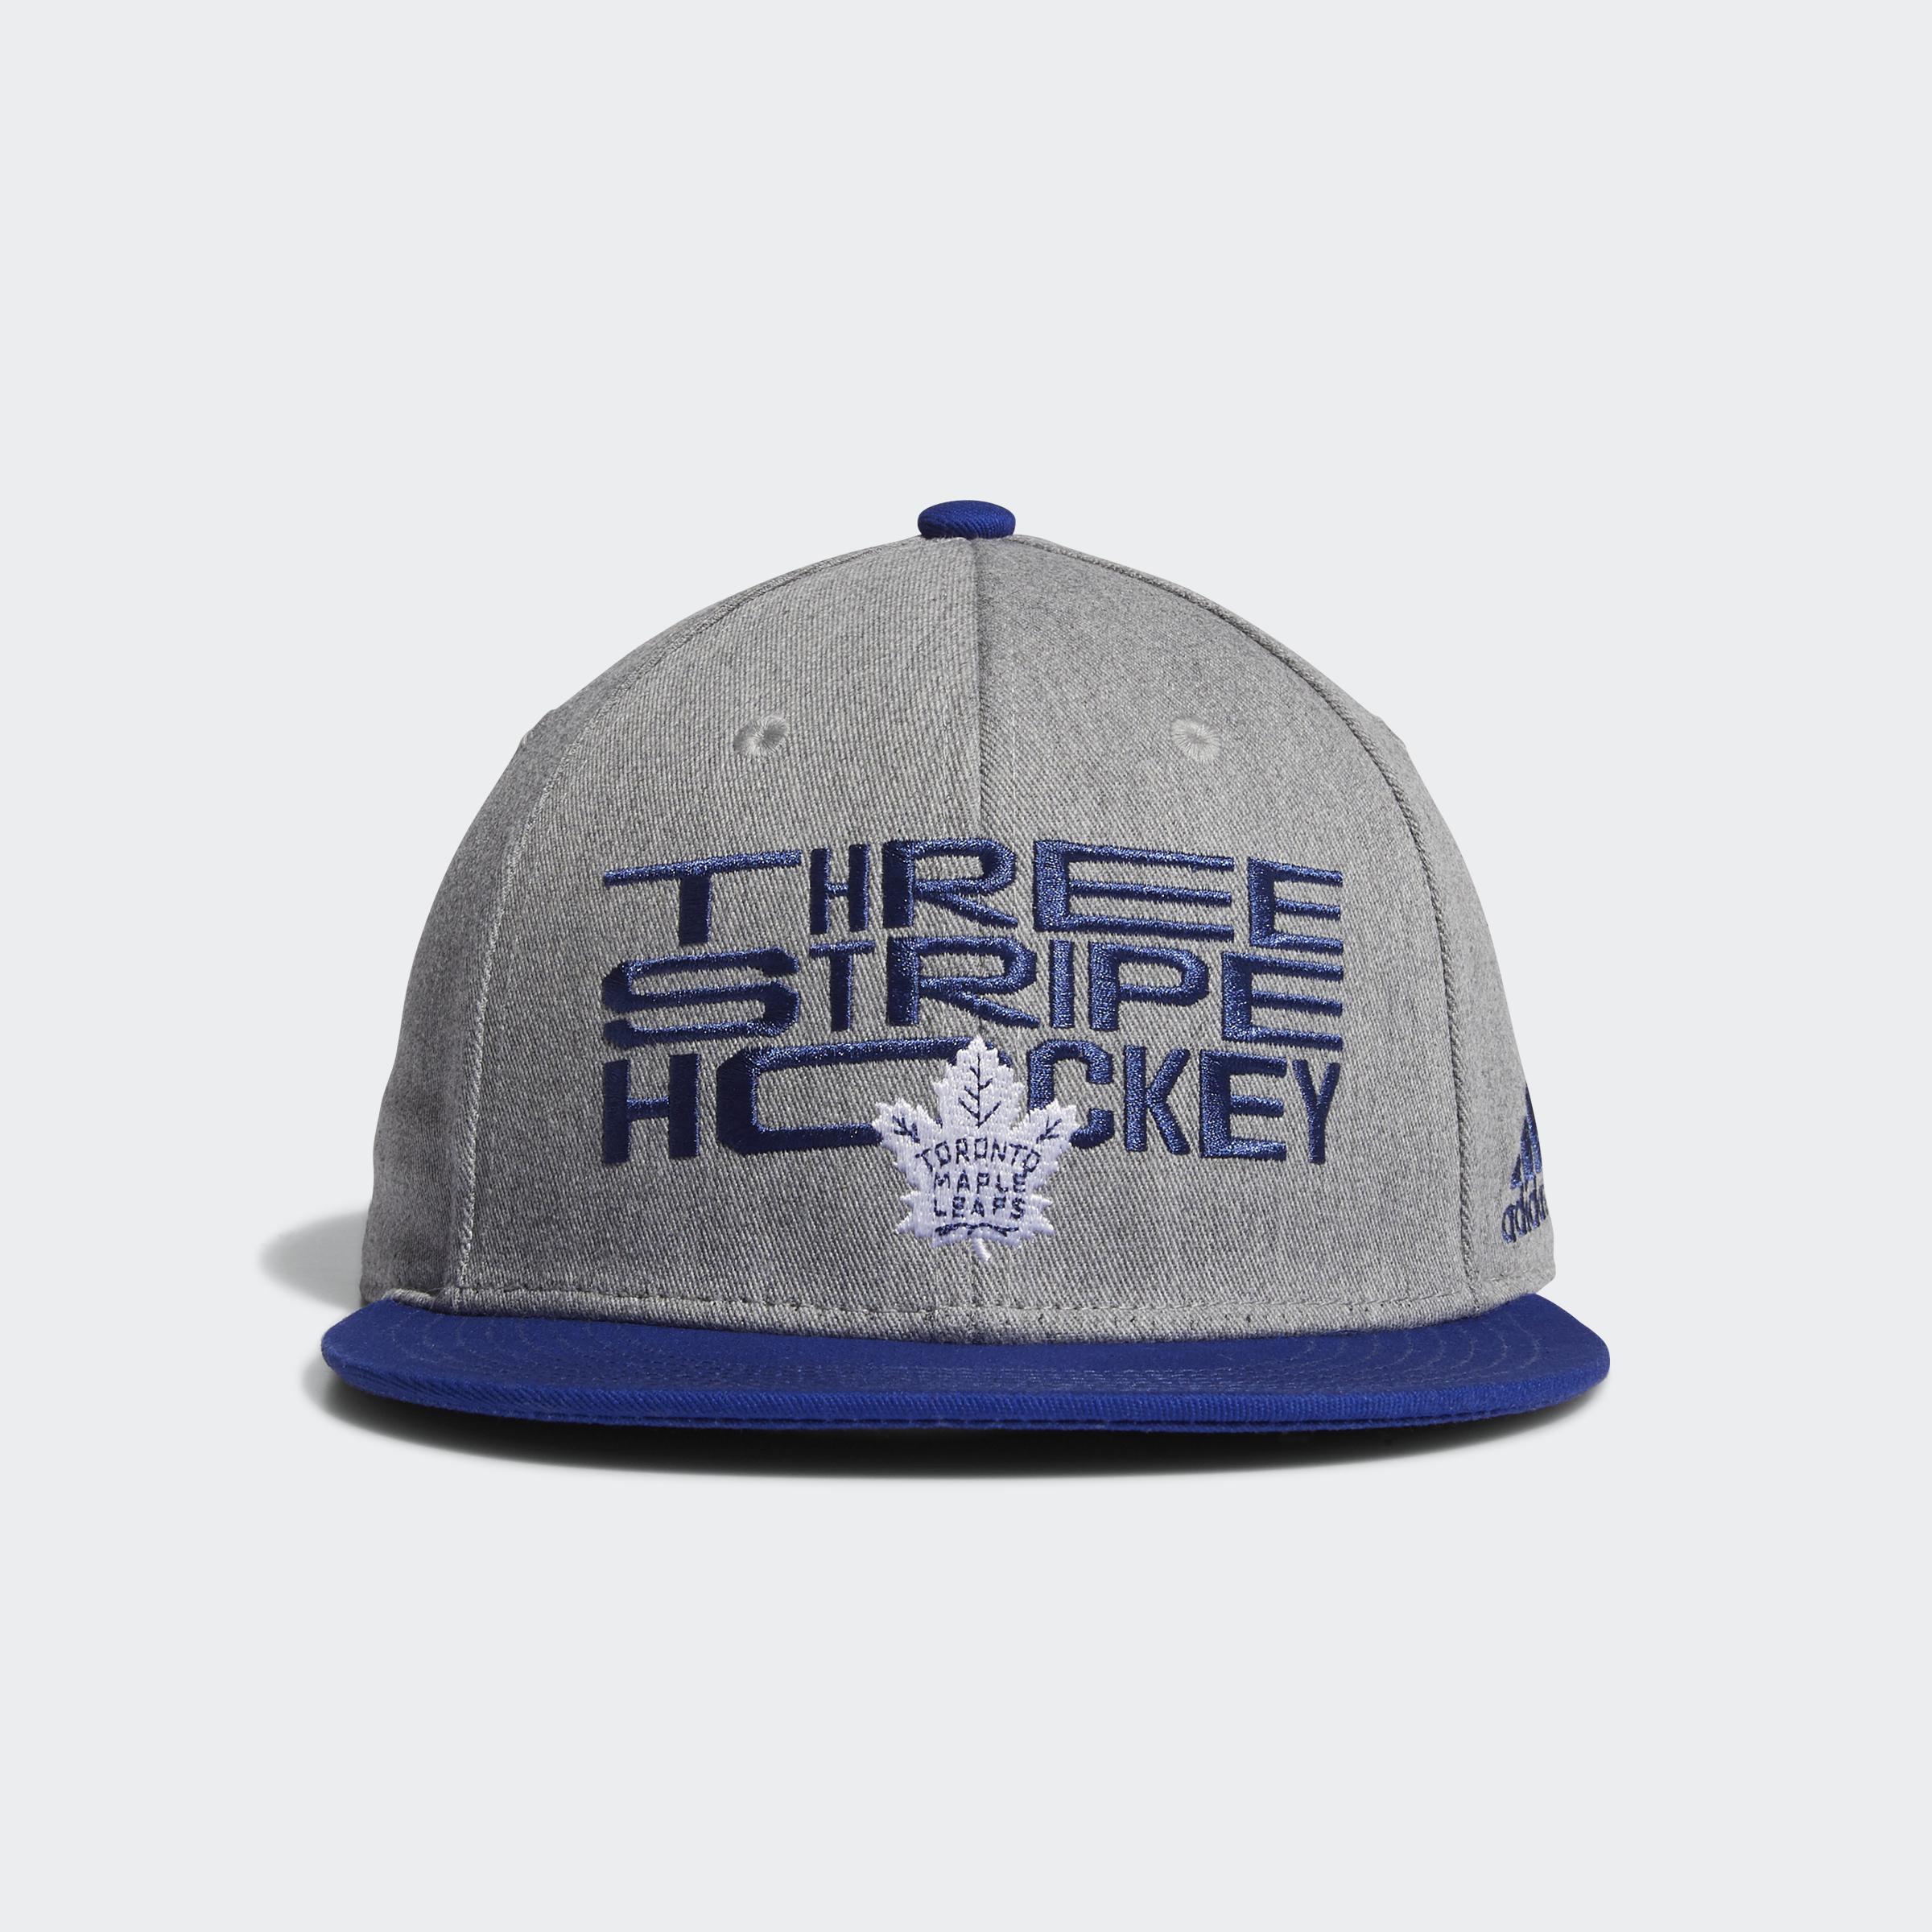 adidas-Vancouver-Canucks-Three-Stripe-Hockey-Snapback-Cap-Men-039-s-Hats thumbnail 14